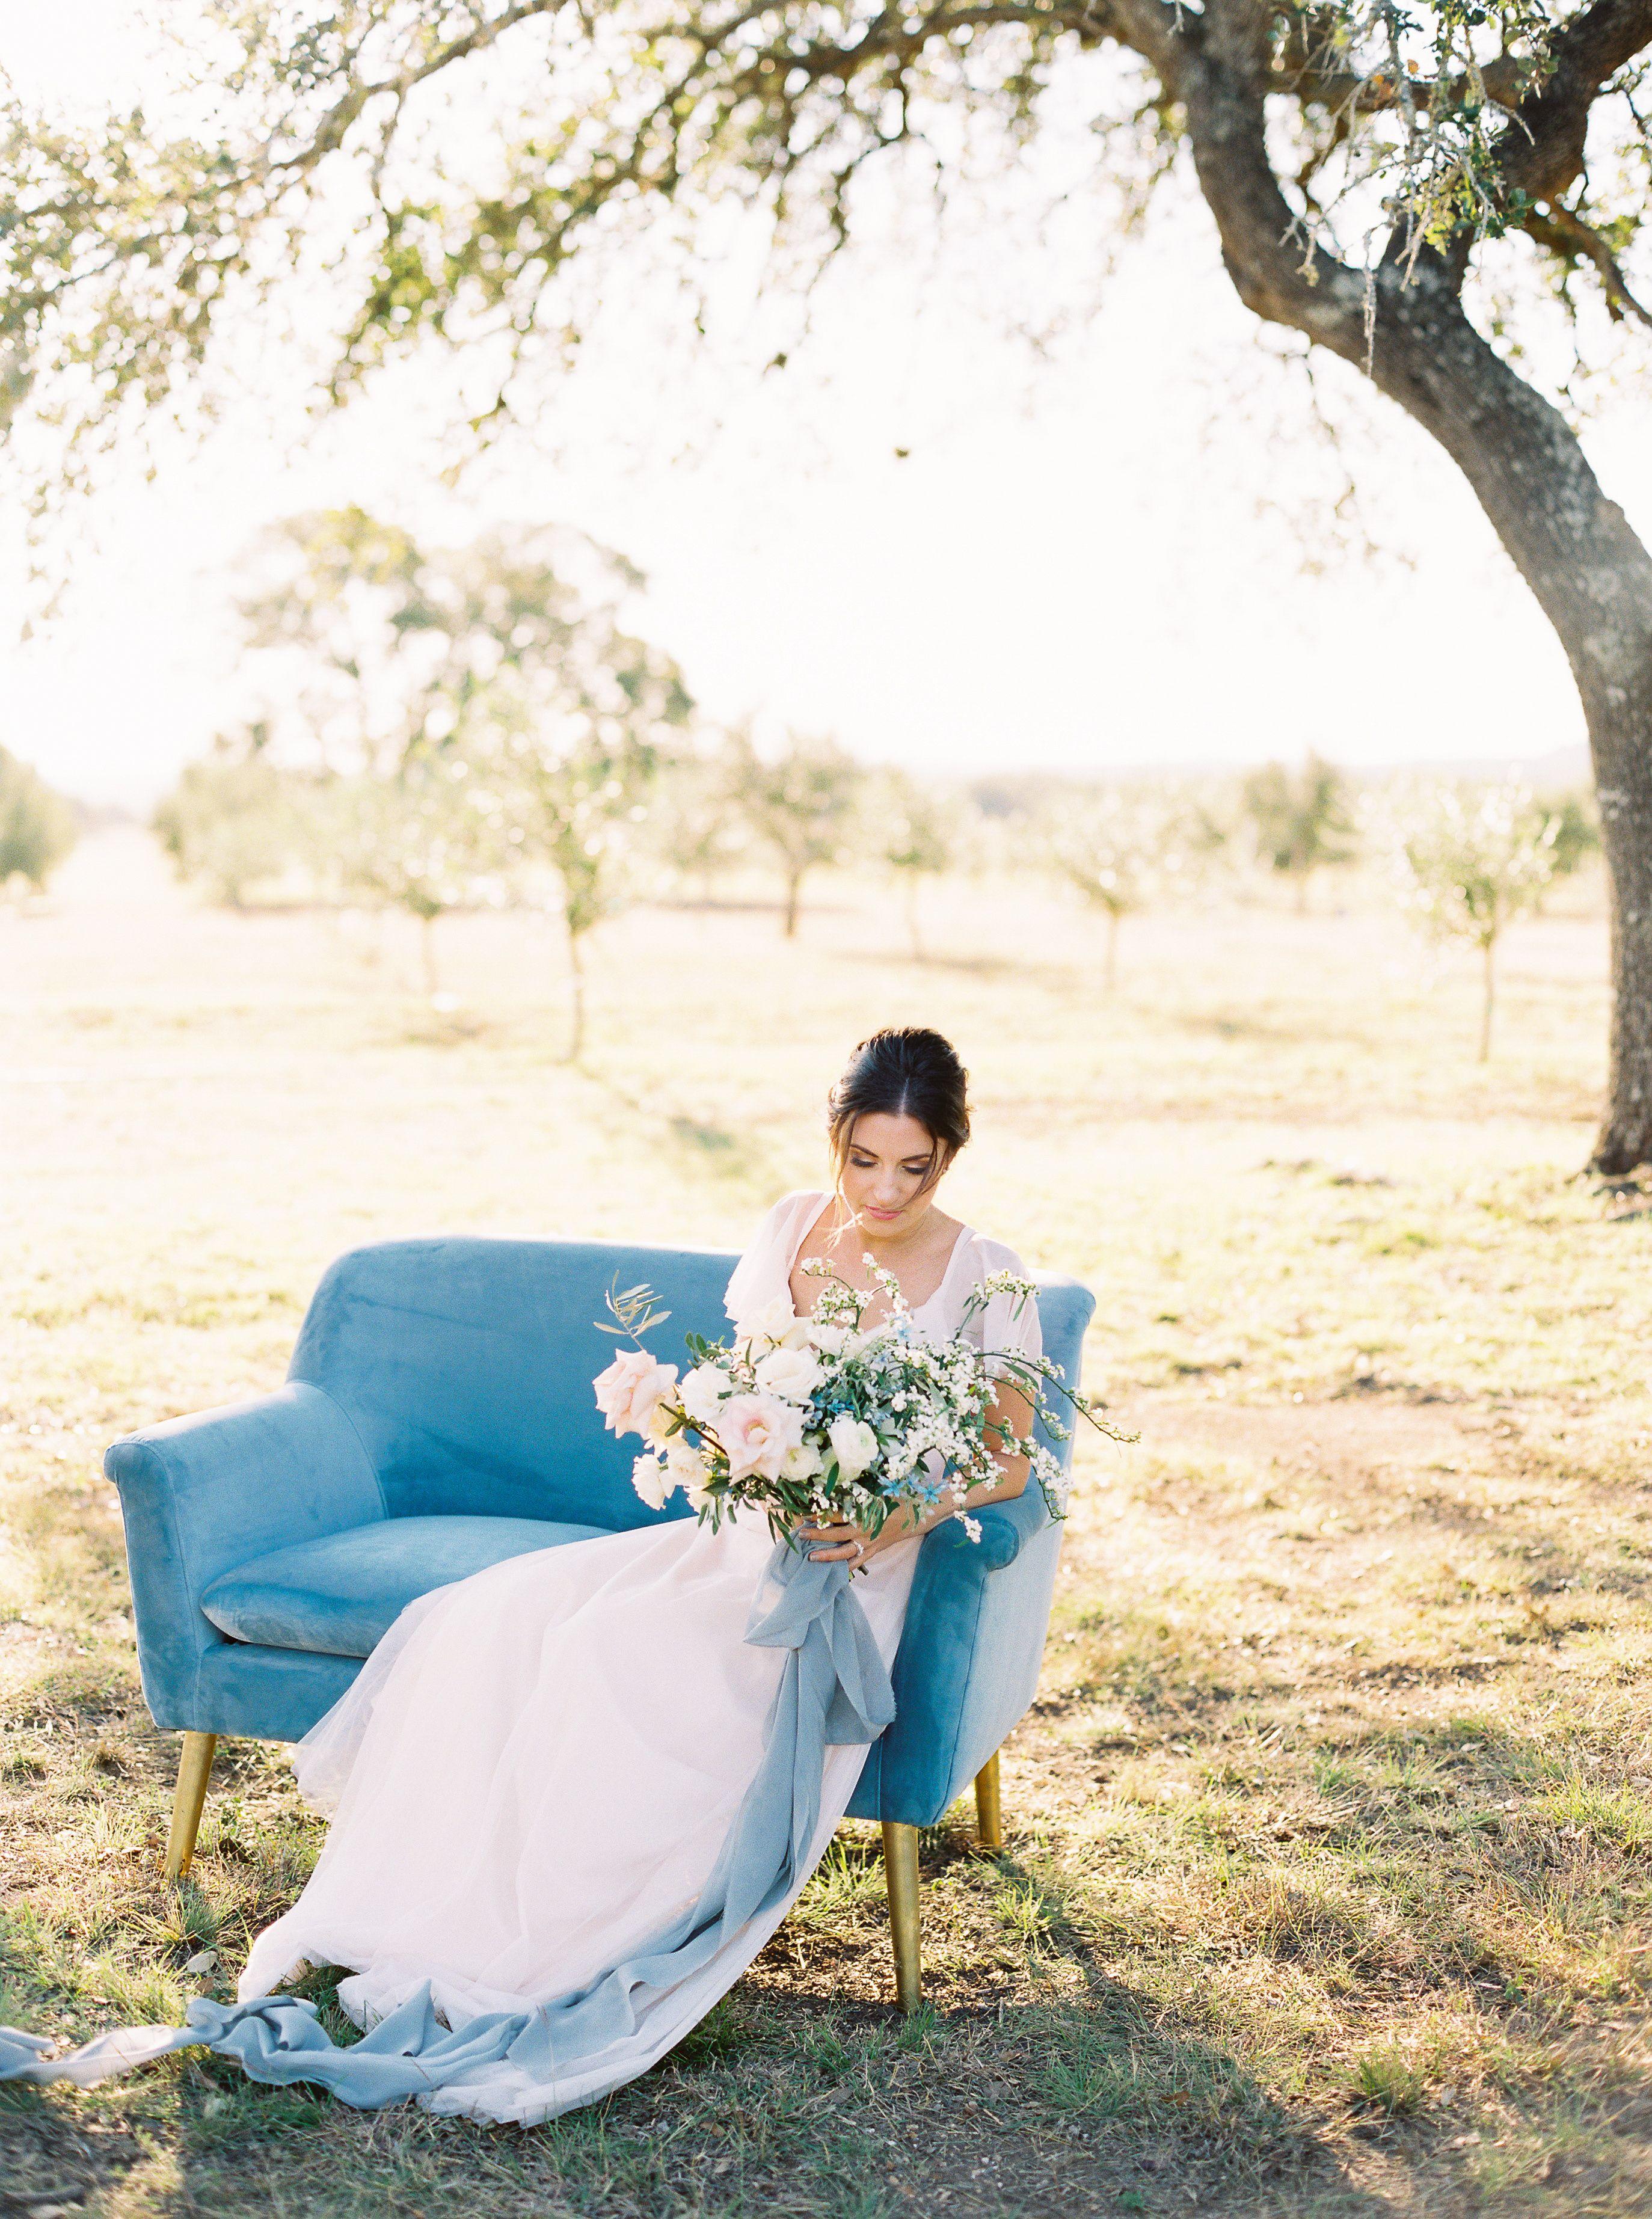 Wedding rental wedding sofa bridal shots handmade sips and